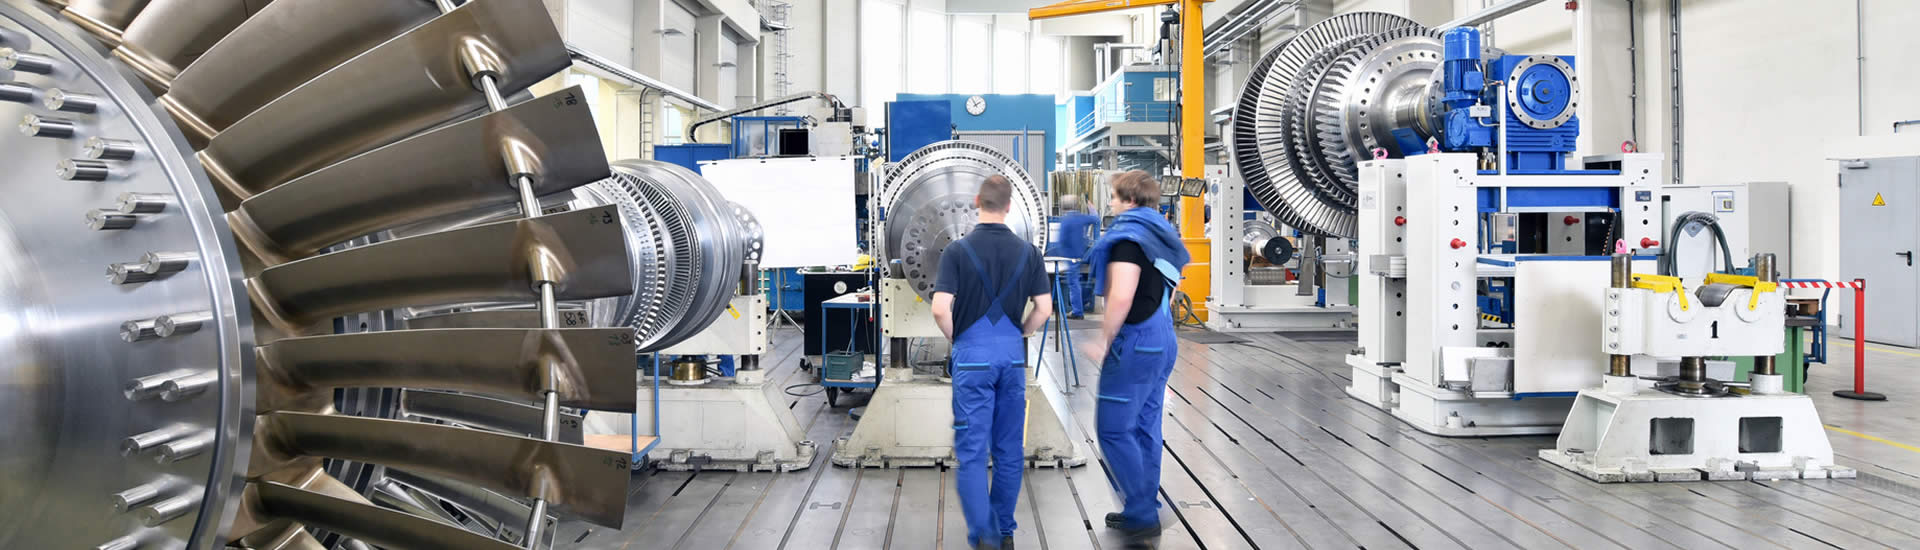 Maschinenbau Branche